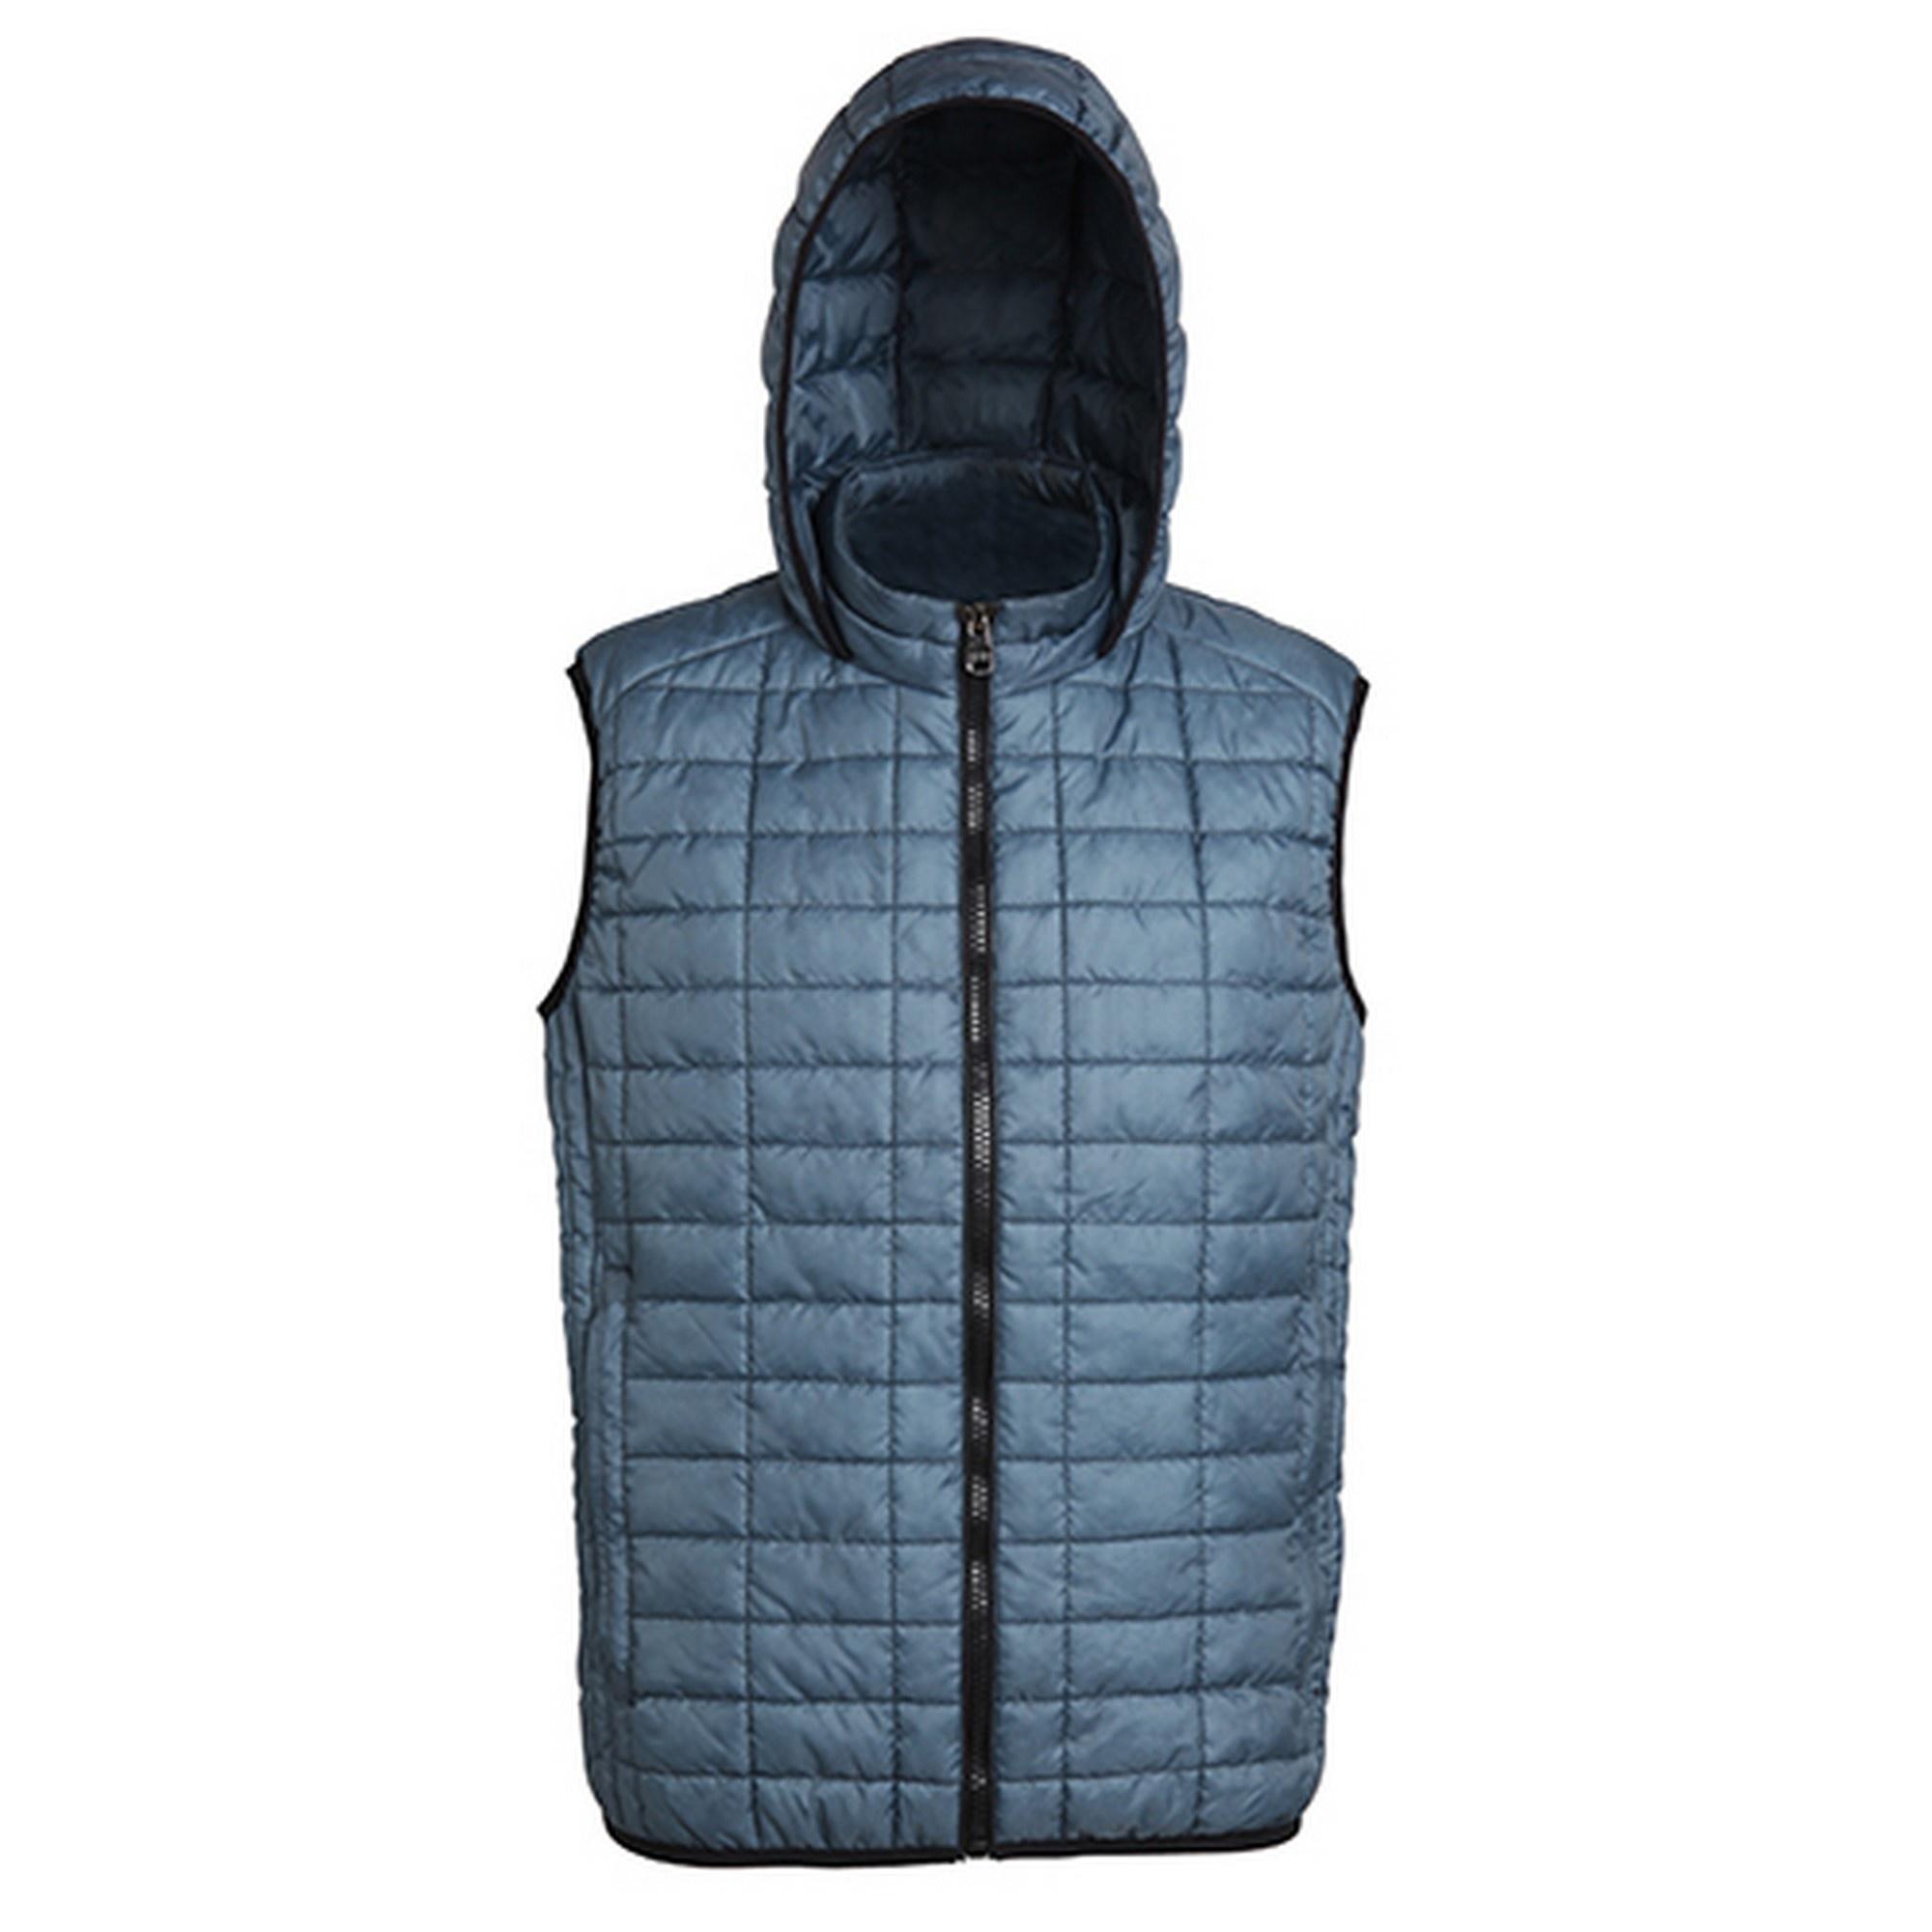 2786 Mens Honeycomb Zip Up Hooded Gilet/Bodywarmer (XL) (Steel)